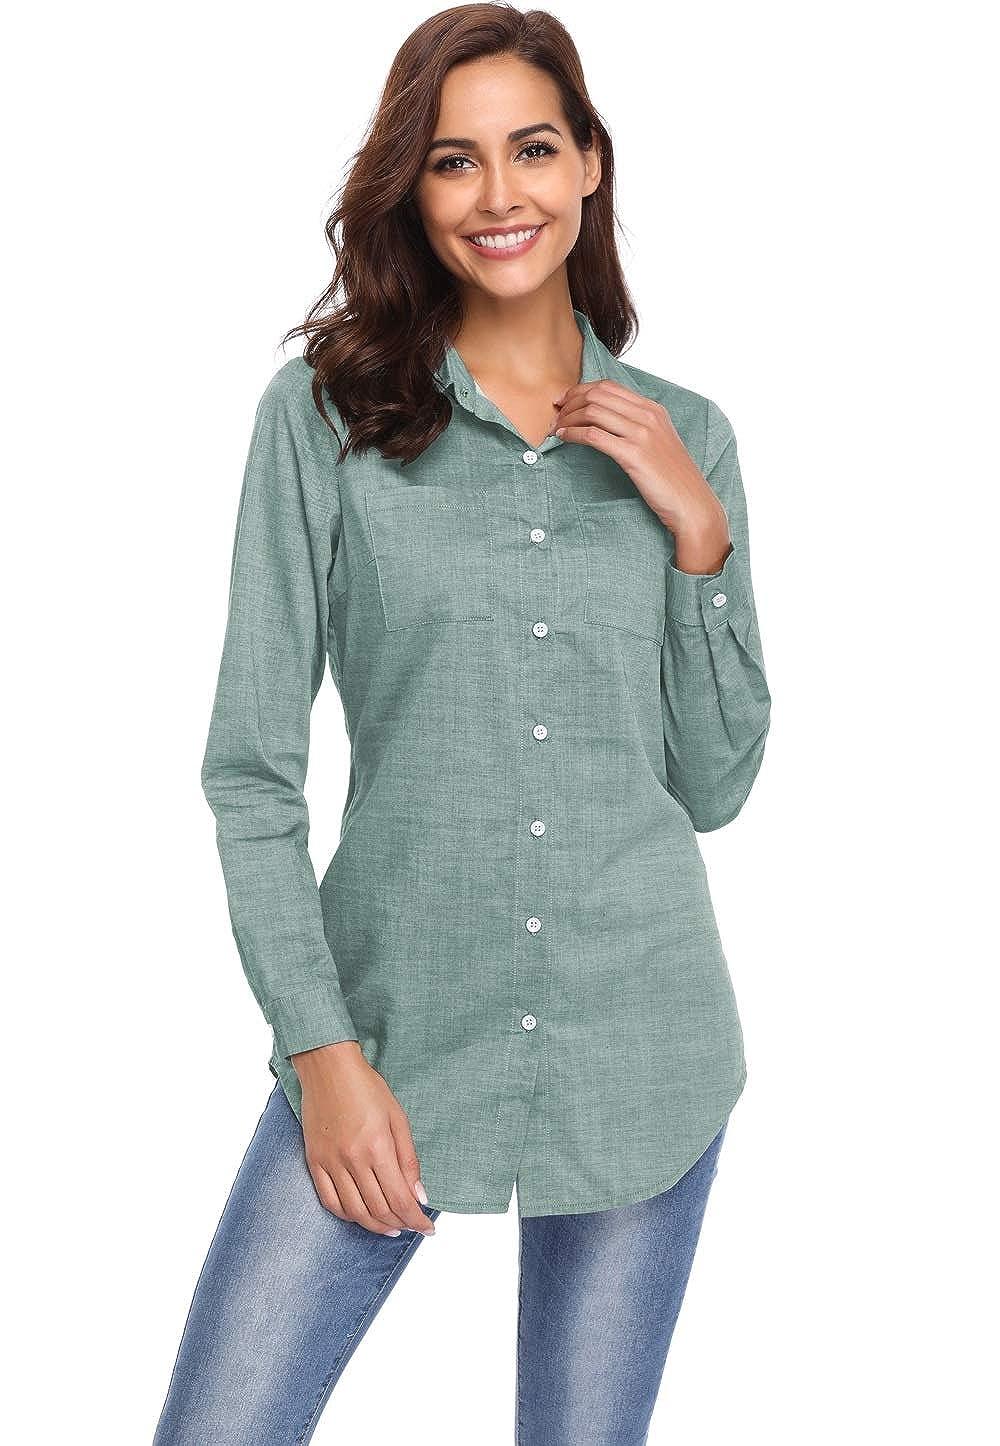 4da7c132f6b Argstar Women's Long Chambray Shirt Button Down Tunic Long Sleeve Blouse  Jeans Top (XS~2XL) Clearence at Amazon Women's Clothing store: